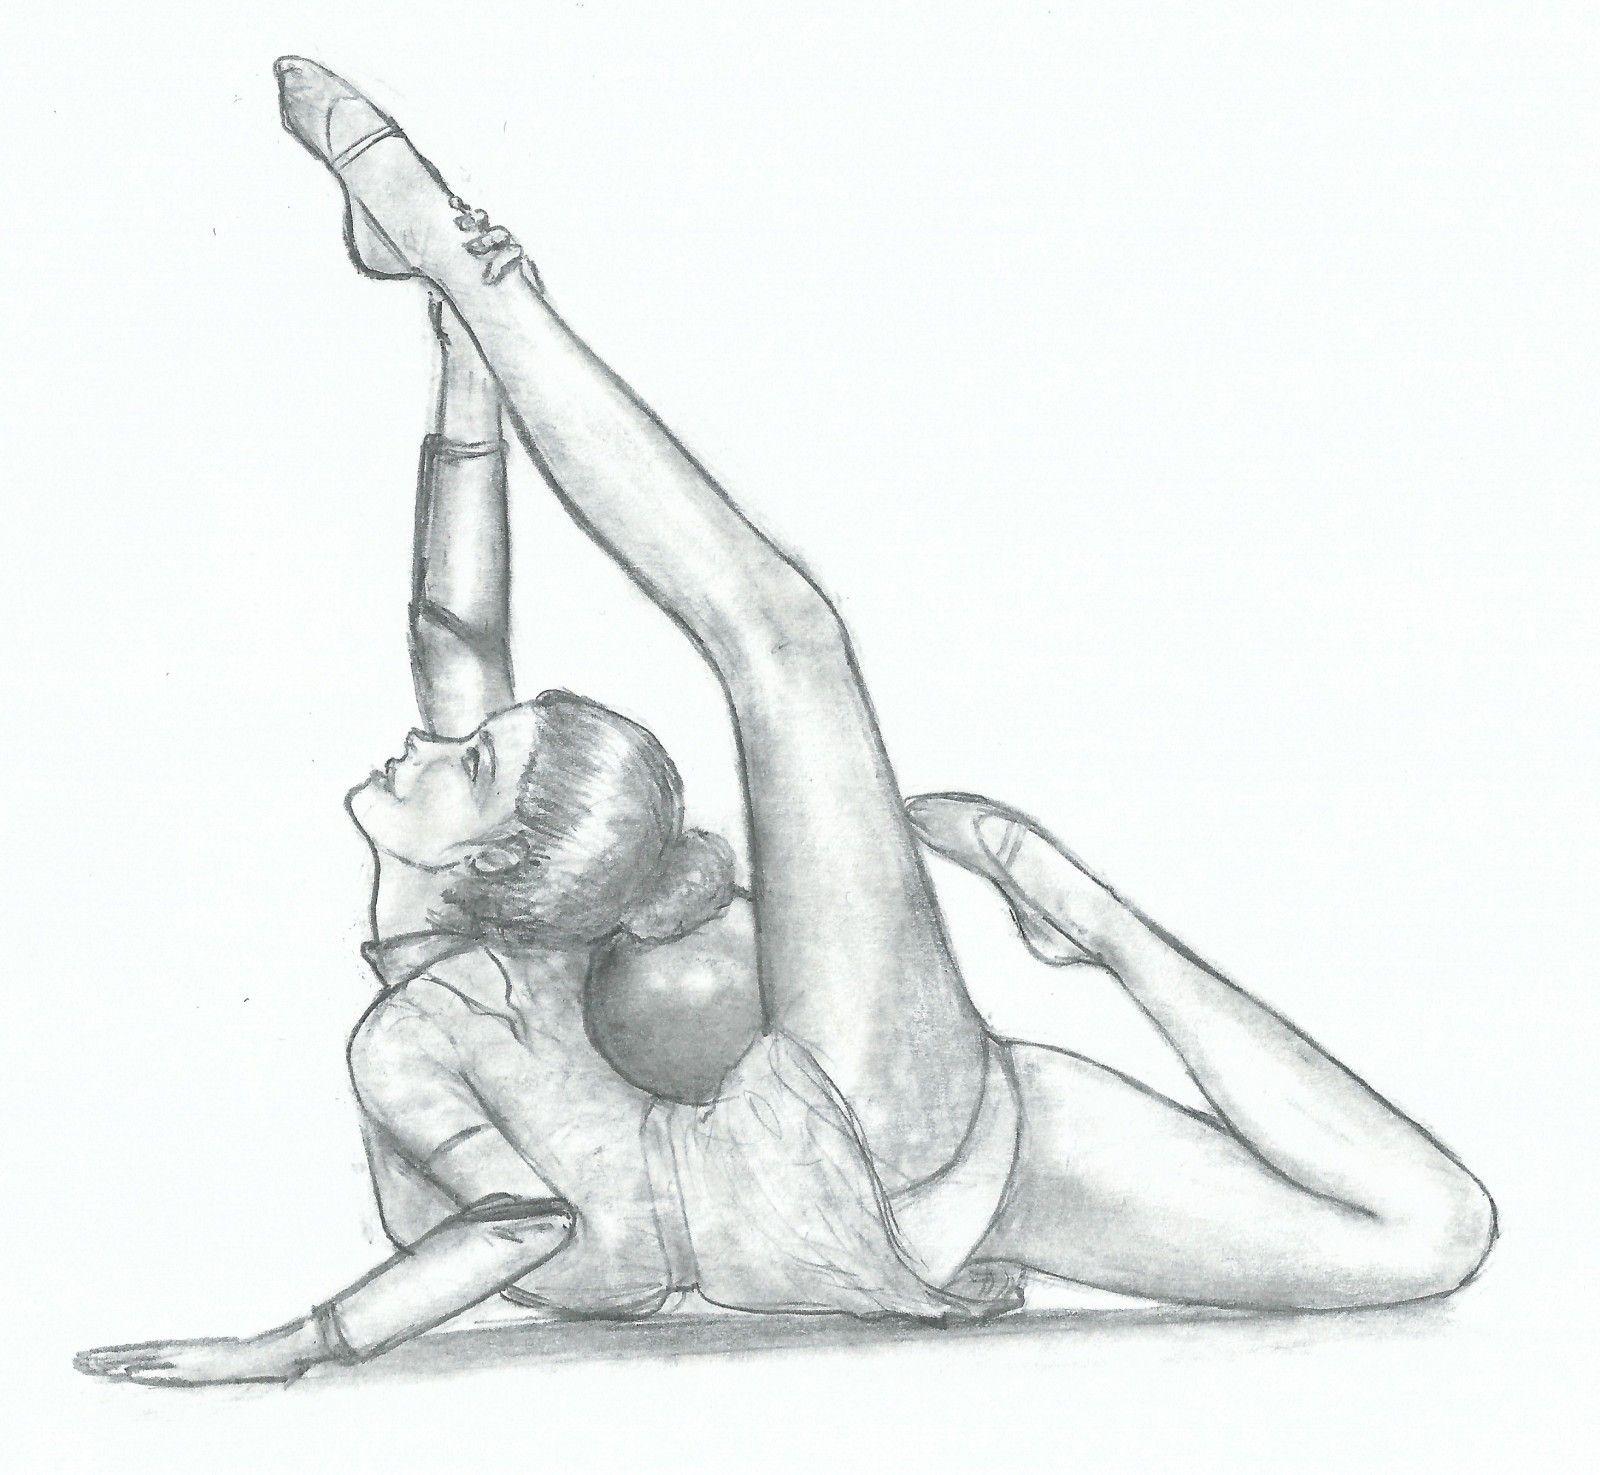 Dessin danseuse de GRS | Gimnasia, Dibujo y Gimnasia rítmica